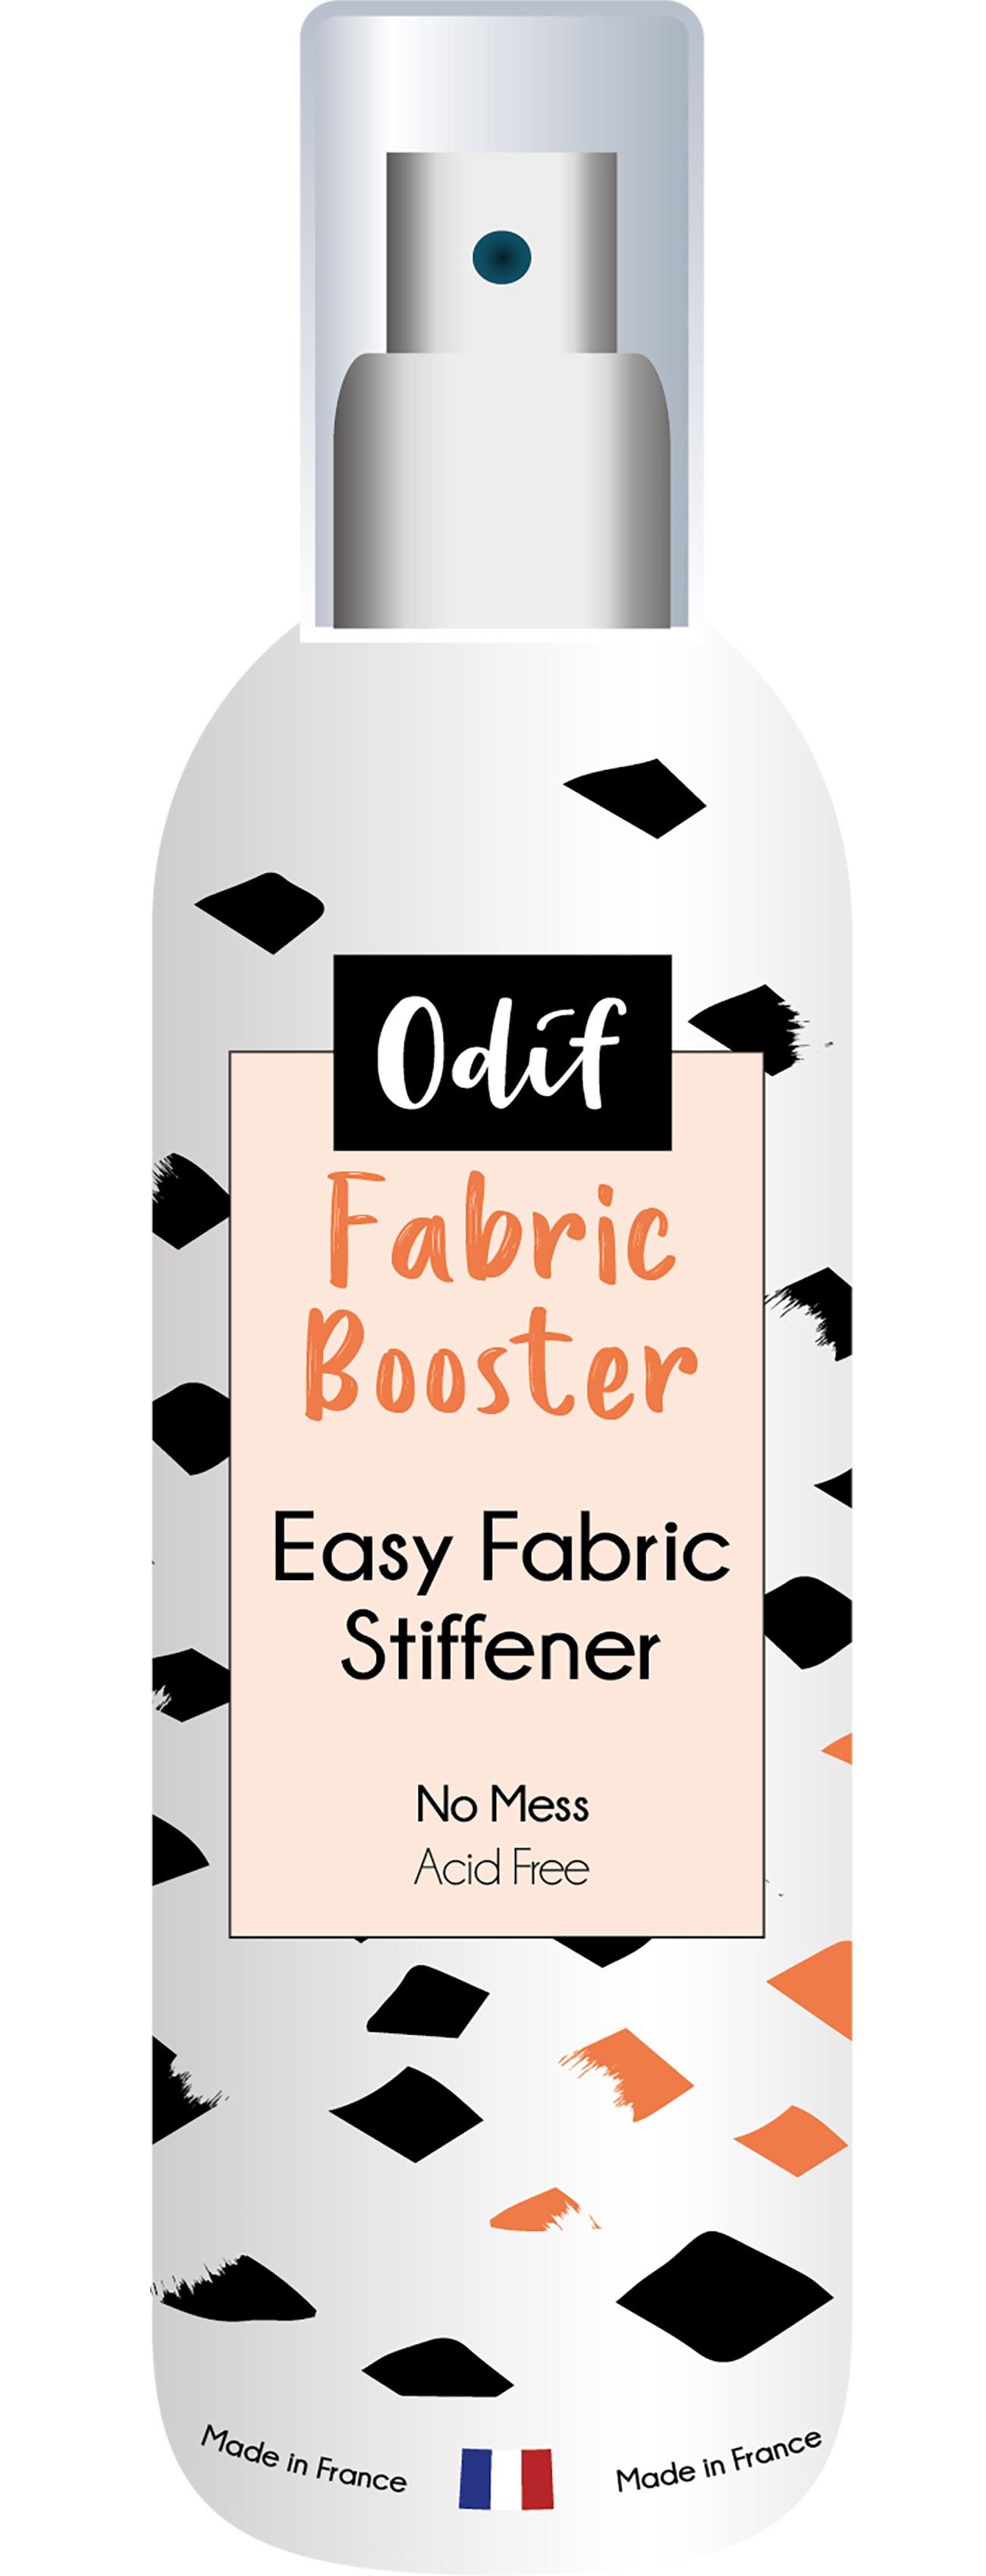 Odif Fabric Booster - Fabric Stabilizer